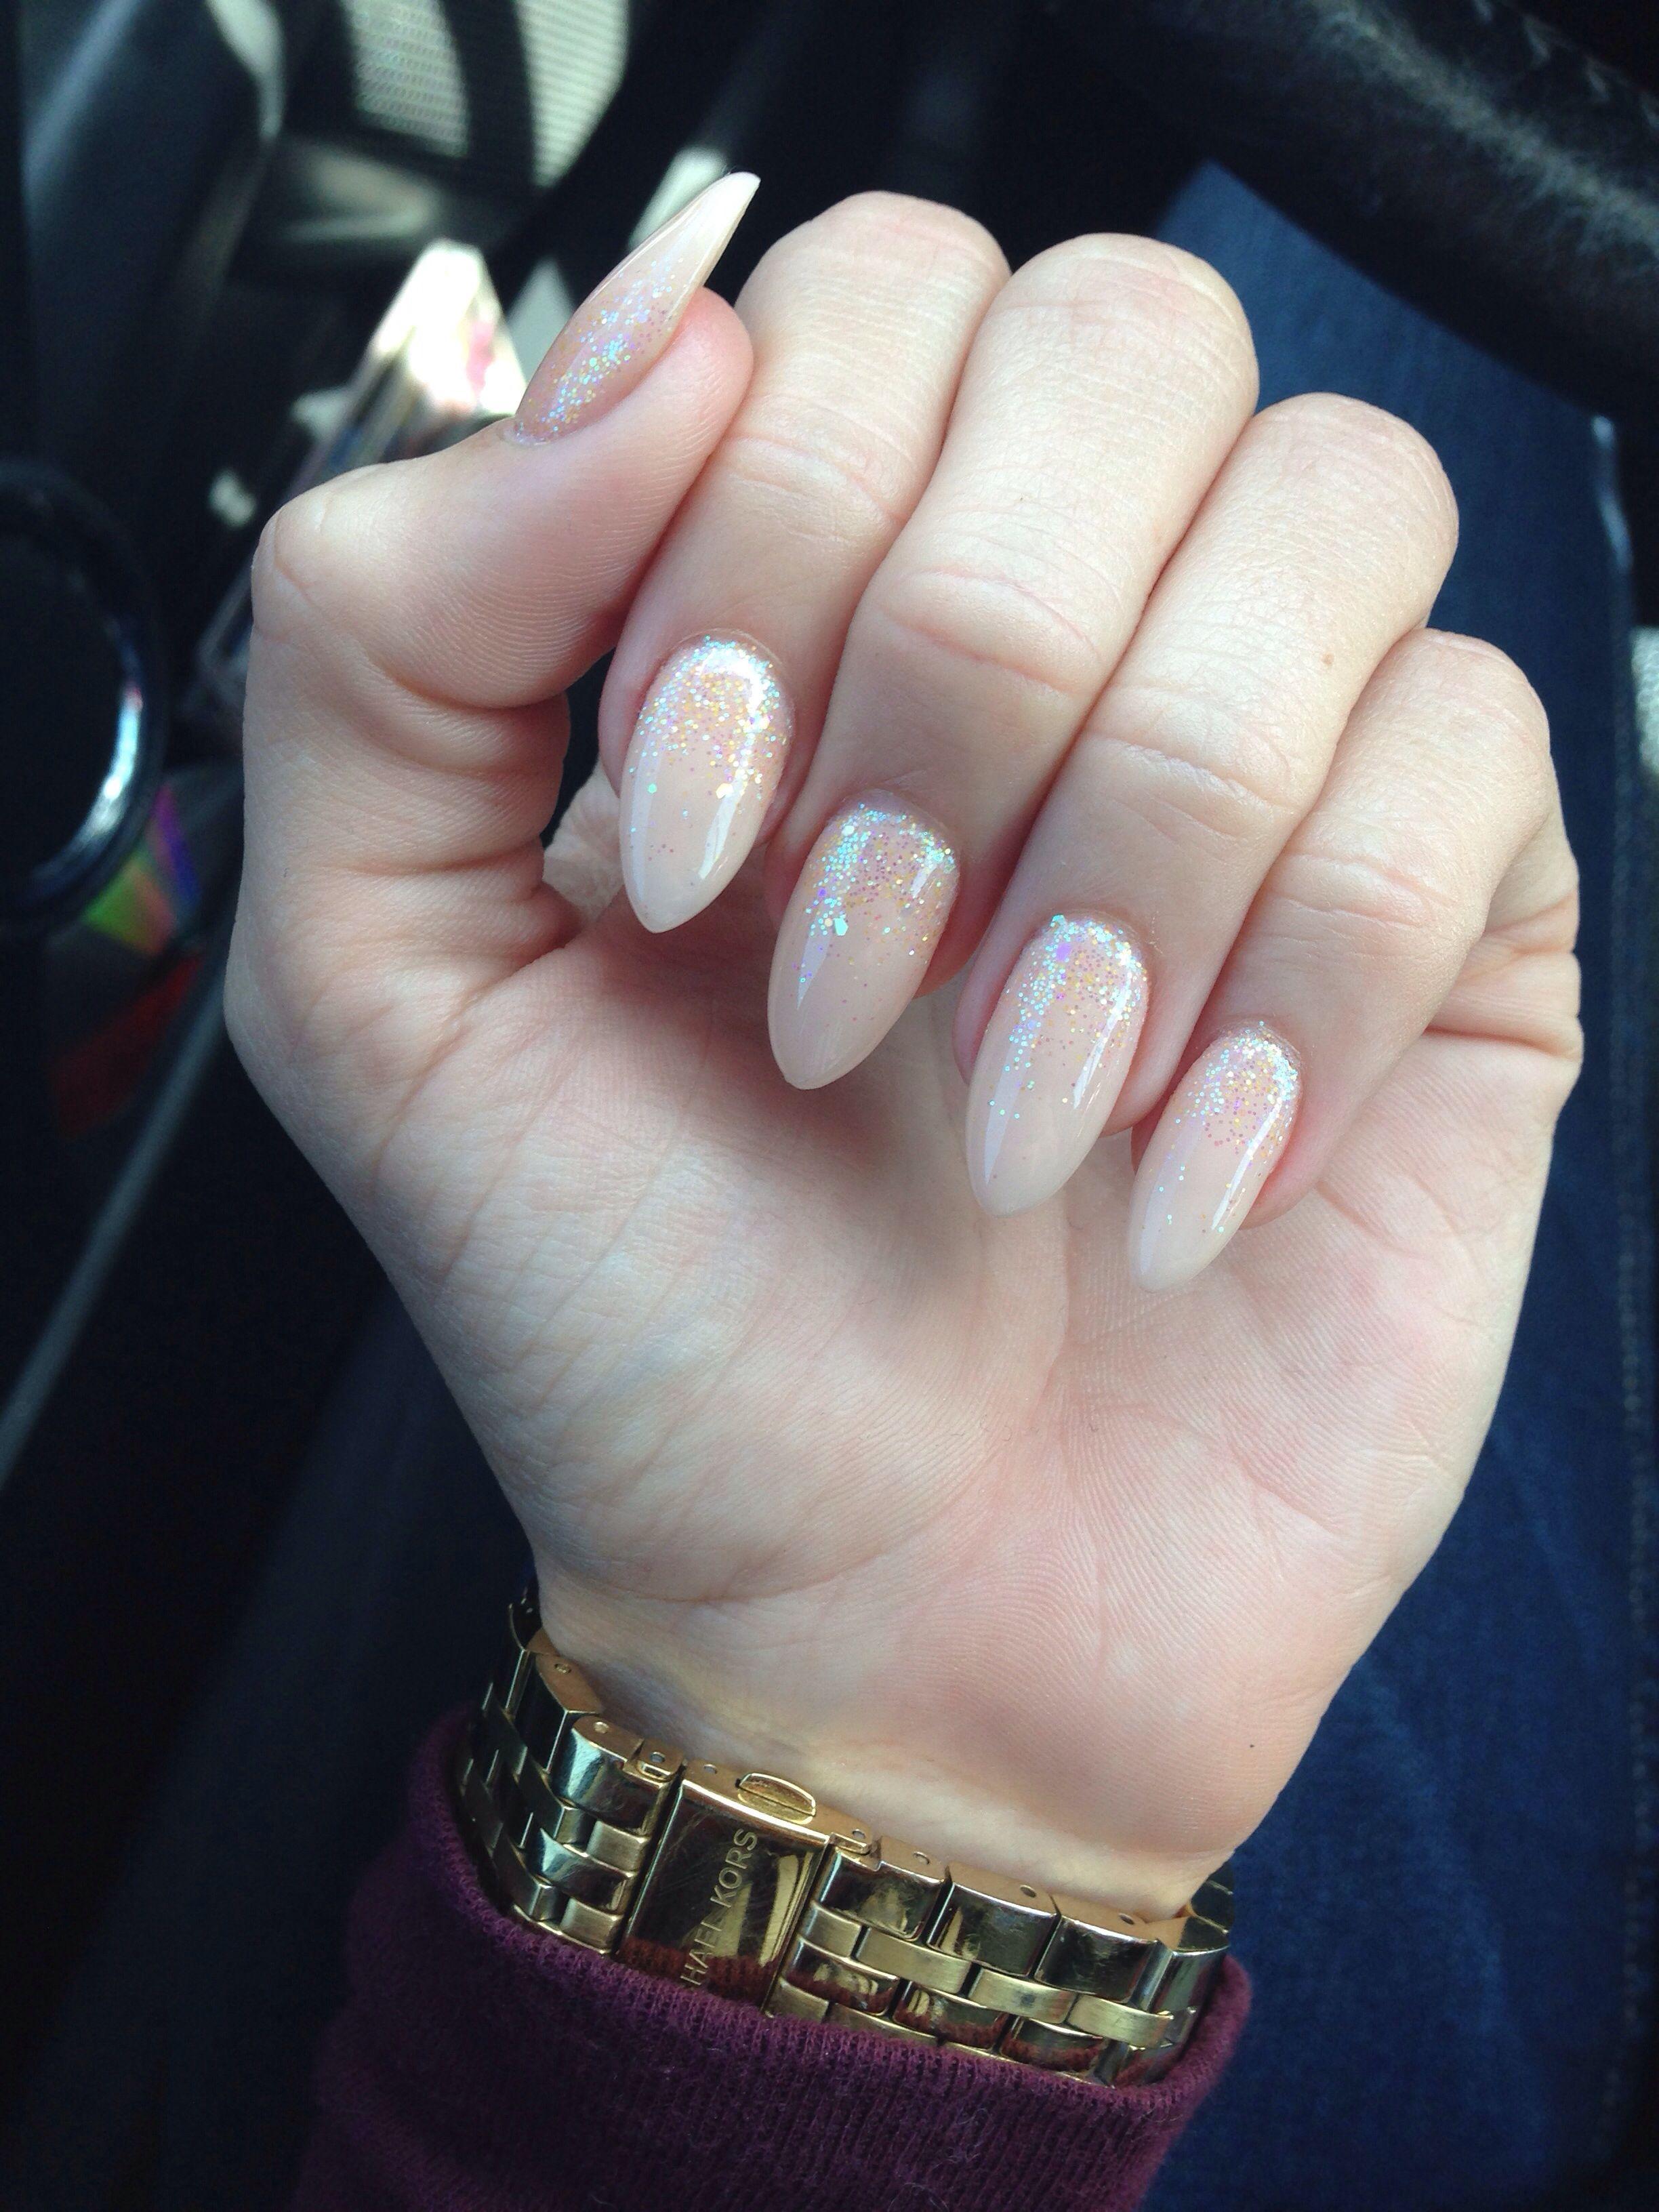 Peachy neutral stiletto nail | Nails | Pinterest